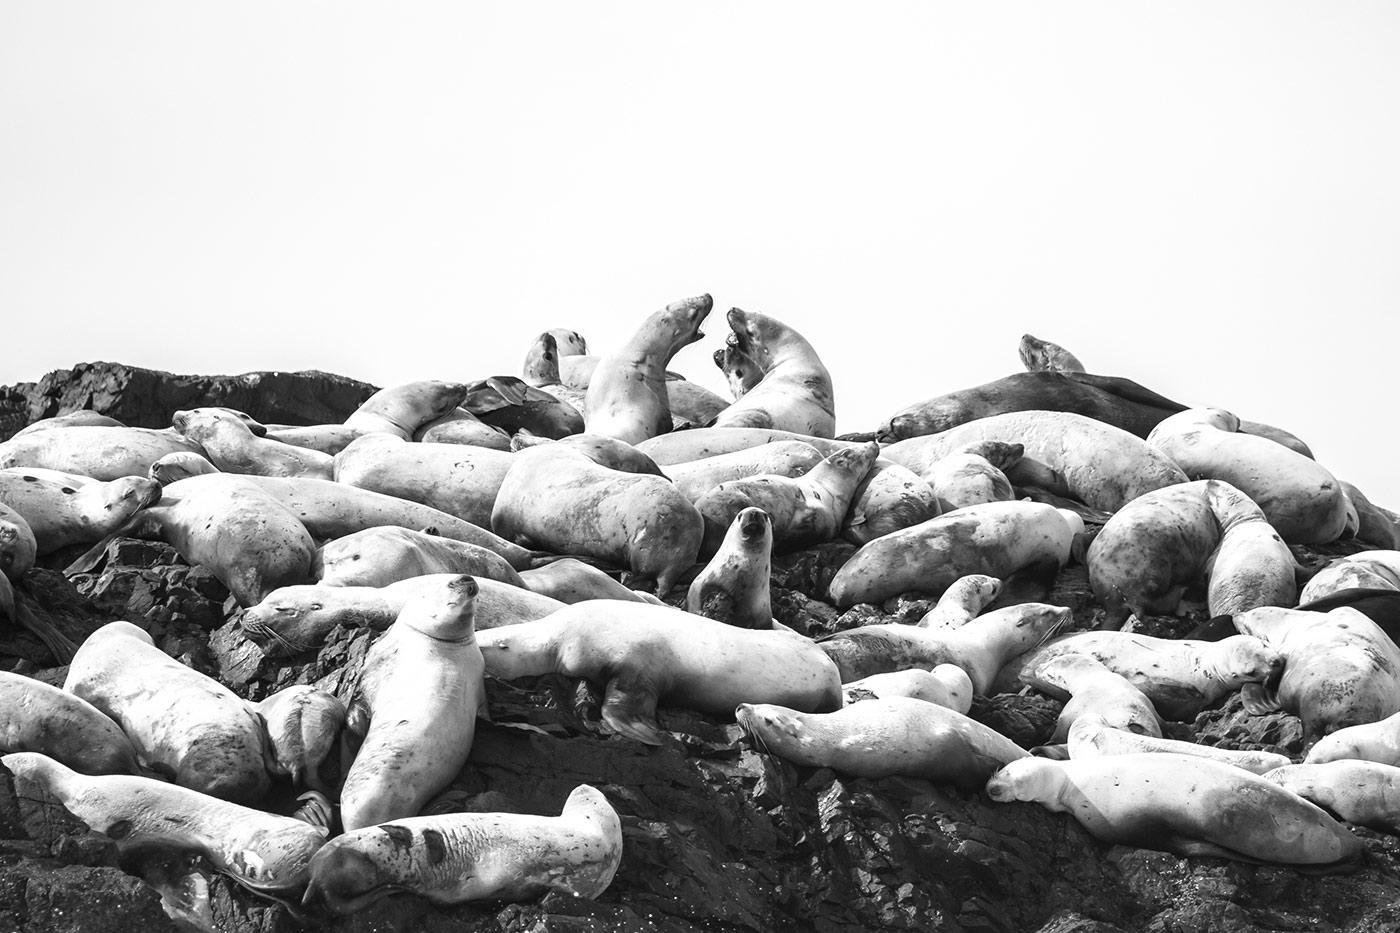 (Stinky) Stellar Sea Lions, Tofino, B.C